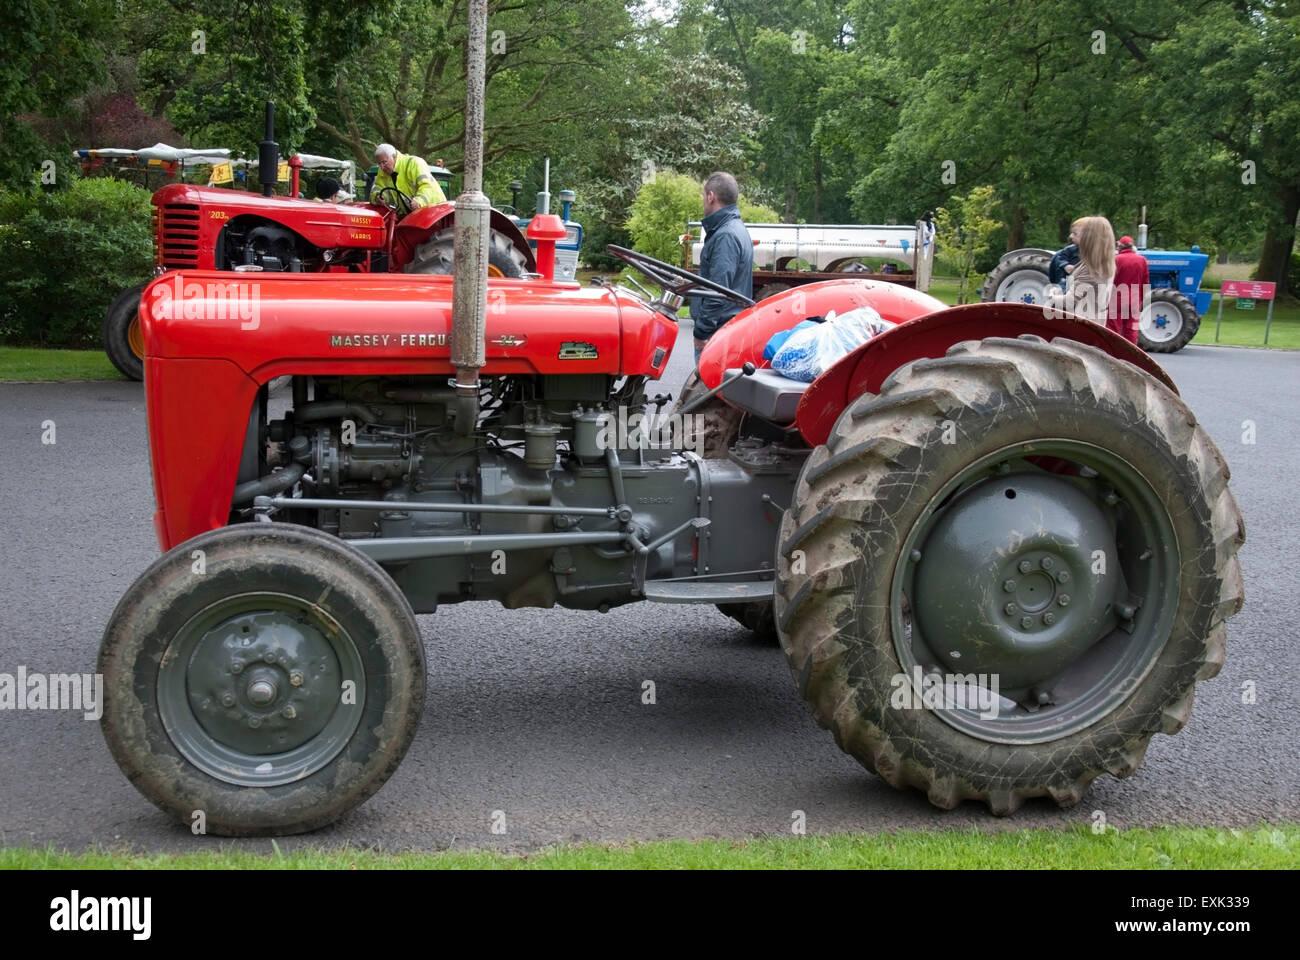 1961 Red Massey Ferguson 35 Model Farm Tractor Stock Photo